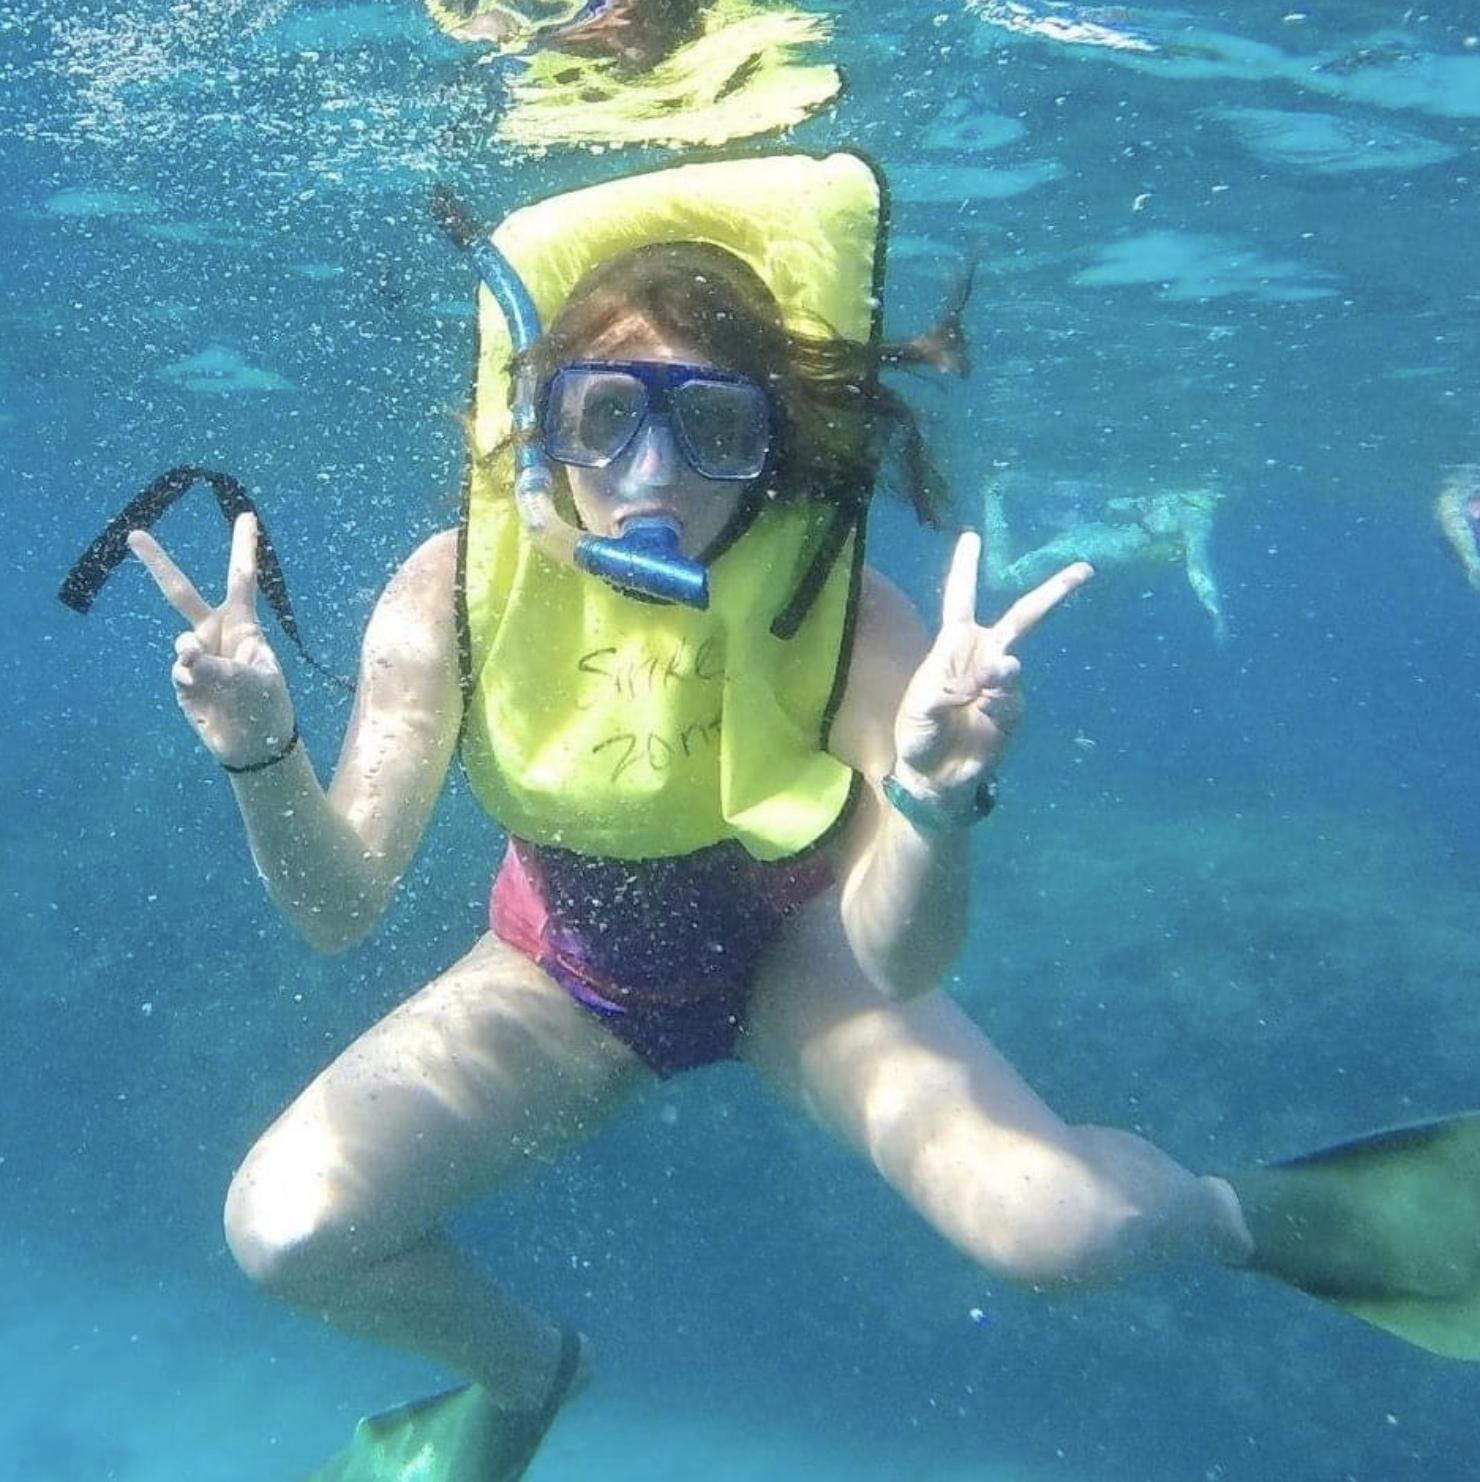 Cheyenne Steinbarger, snorkeling in the Looe Key National Marine Sanctuary in the Florida Keys